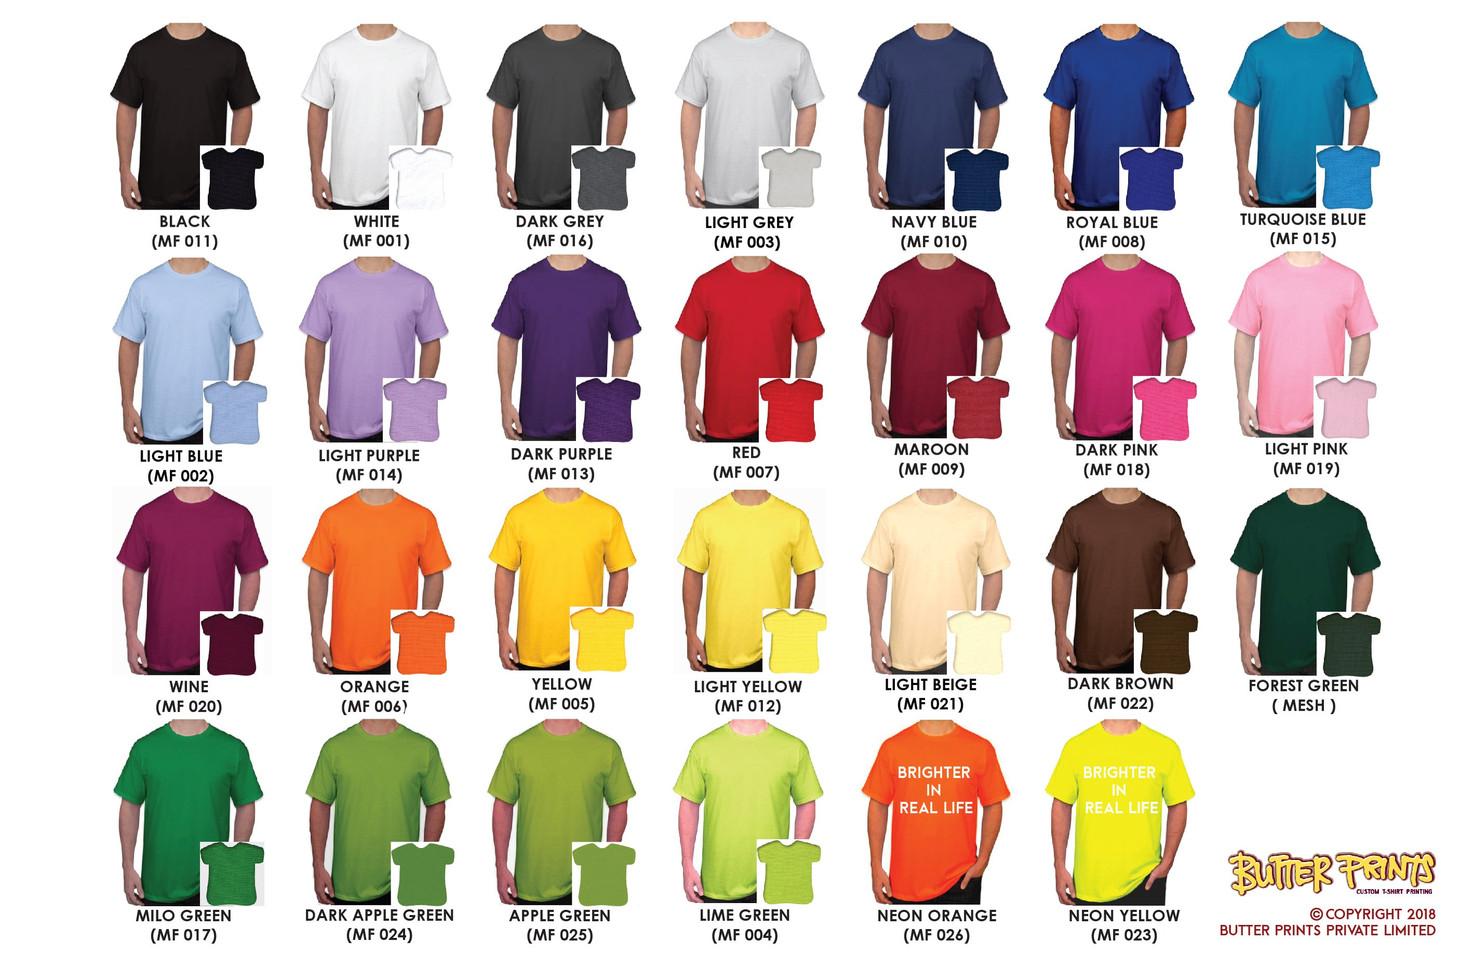 Mini Eyelet Drifit T-shirts Color Chart - Butter Prints